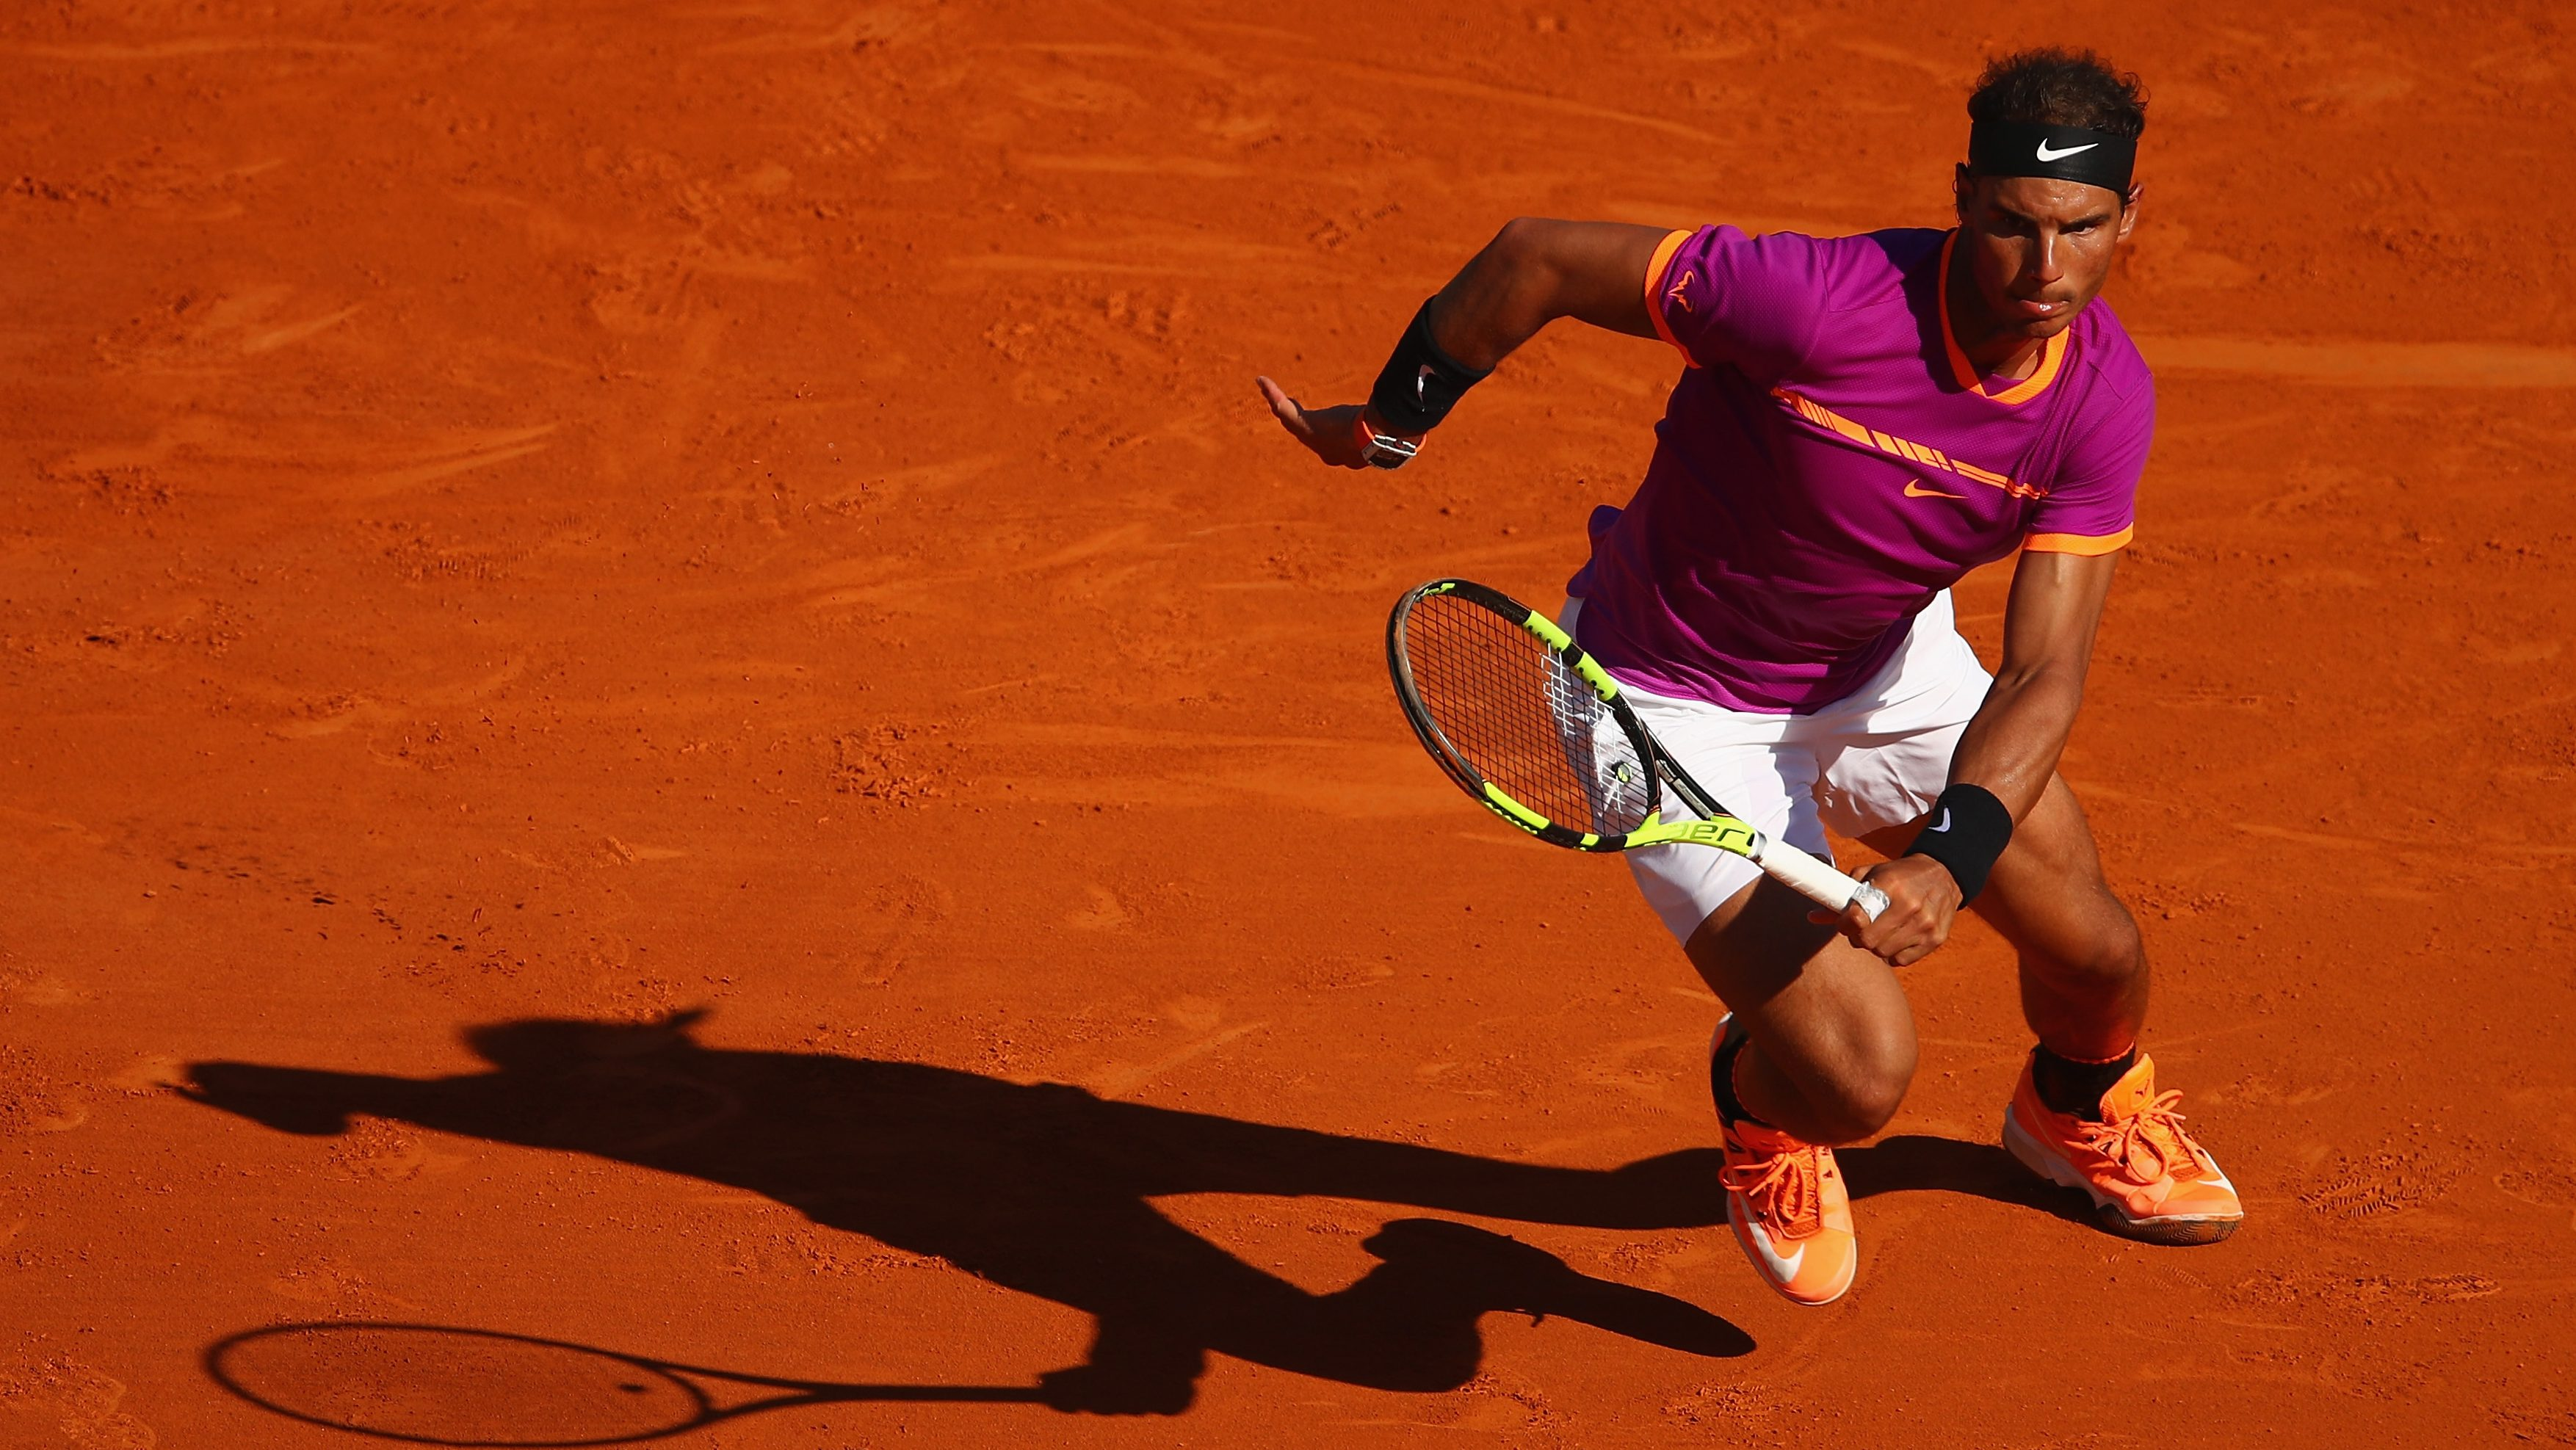 Nadal Vs Schwartzman Live Stream How To Watch Online Heavy Com